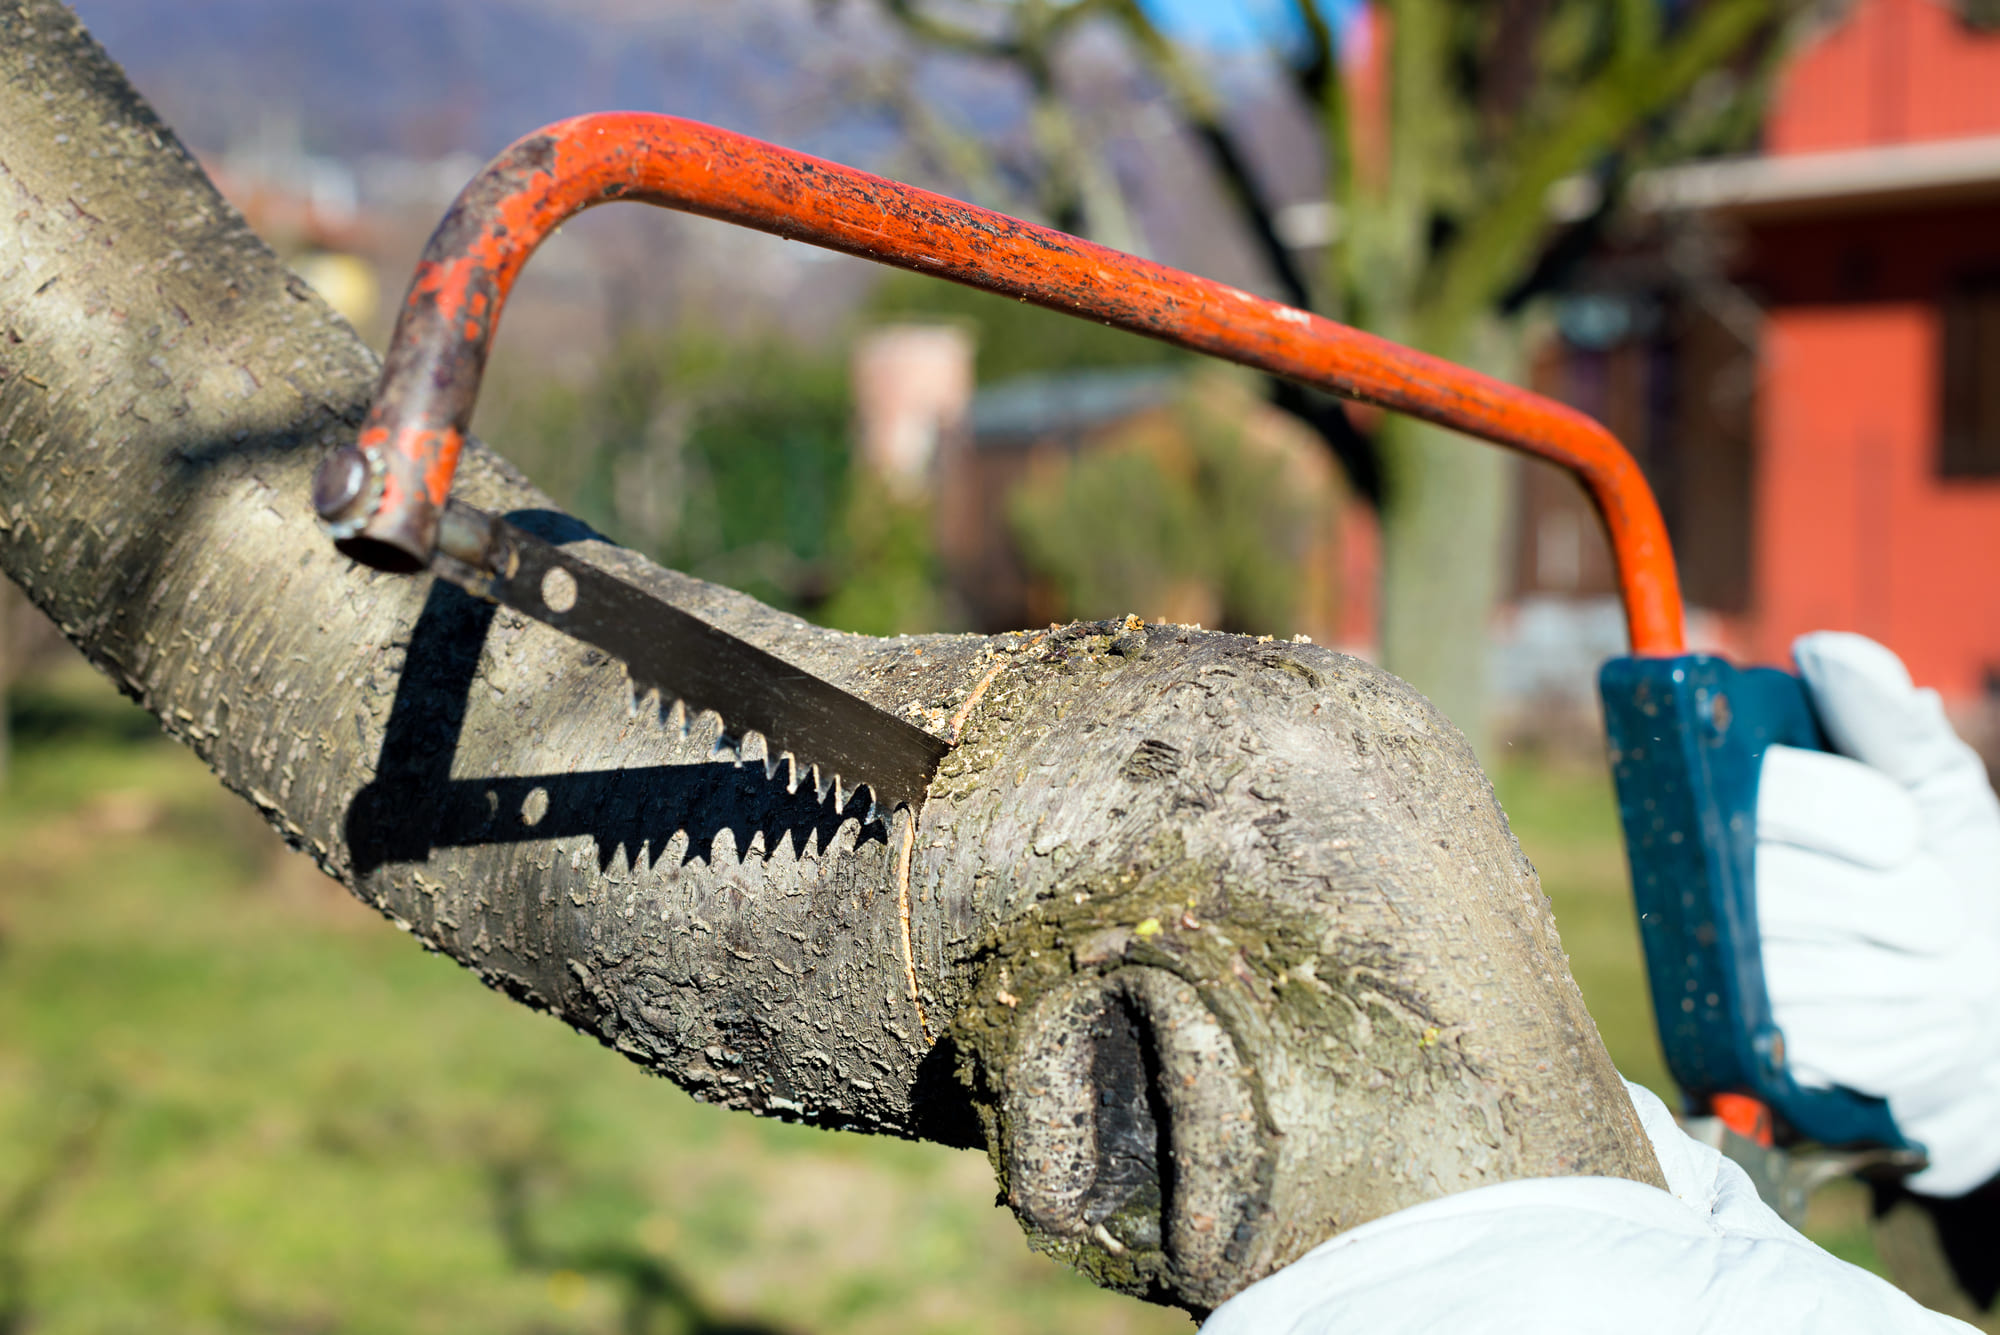 arborist cutting a tree - Big Easy Tree Removal